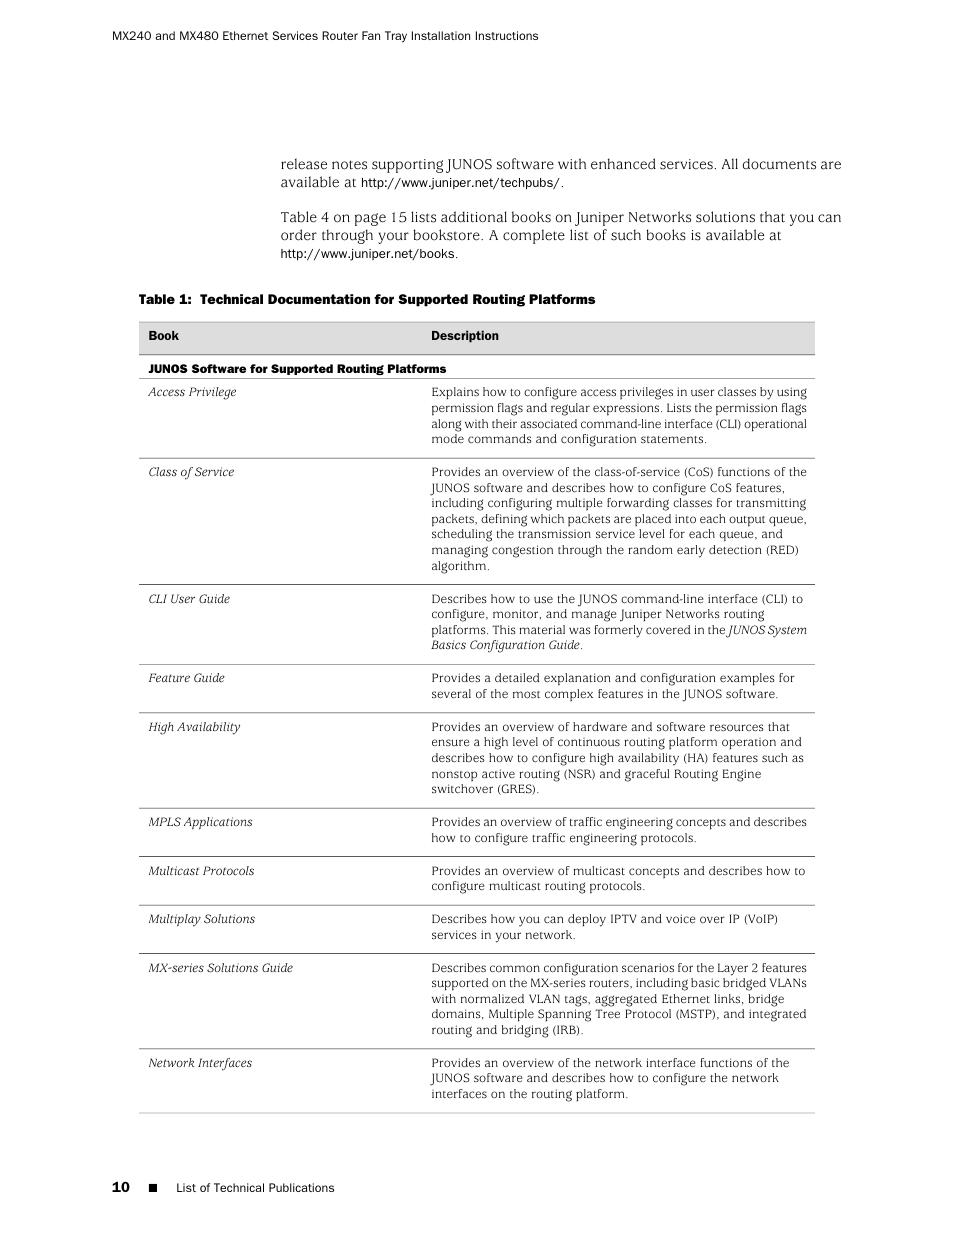 Juniper Networks Juniper MX-series MX480 User Manual | Page